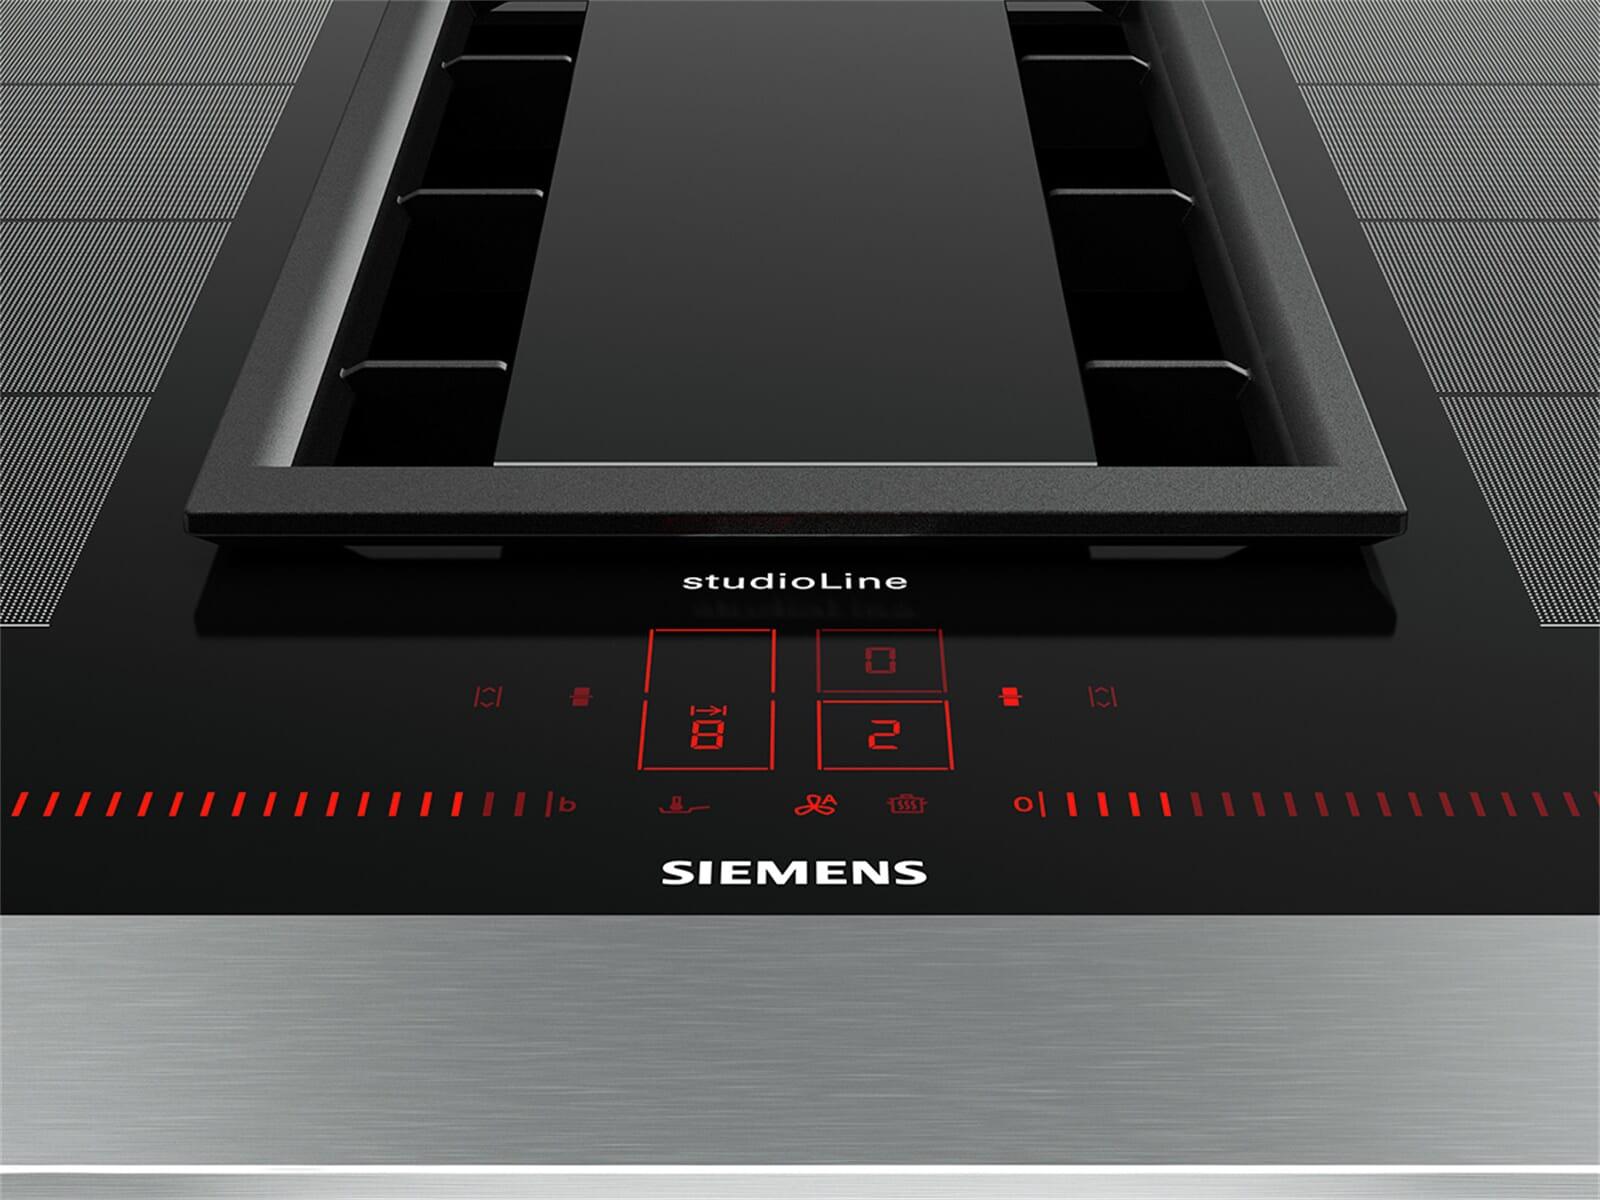 Siemens studioline ex lx e induktionskochfeld dunstabzug